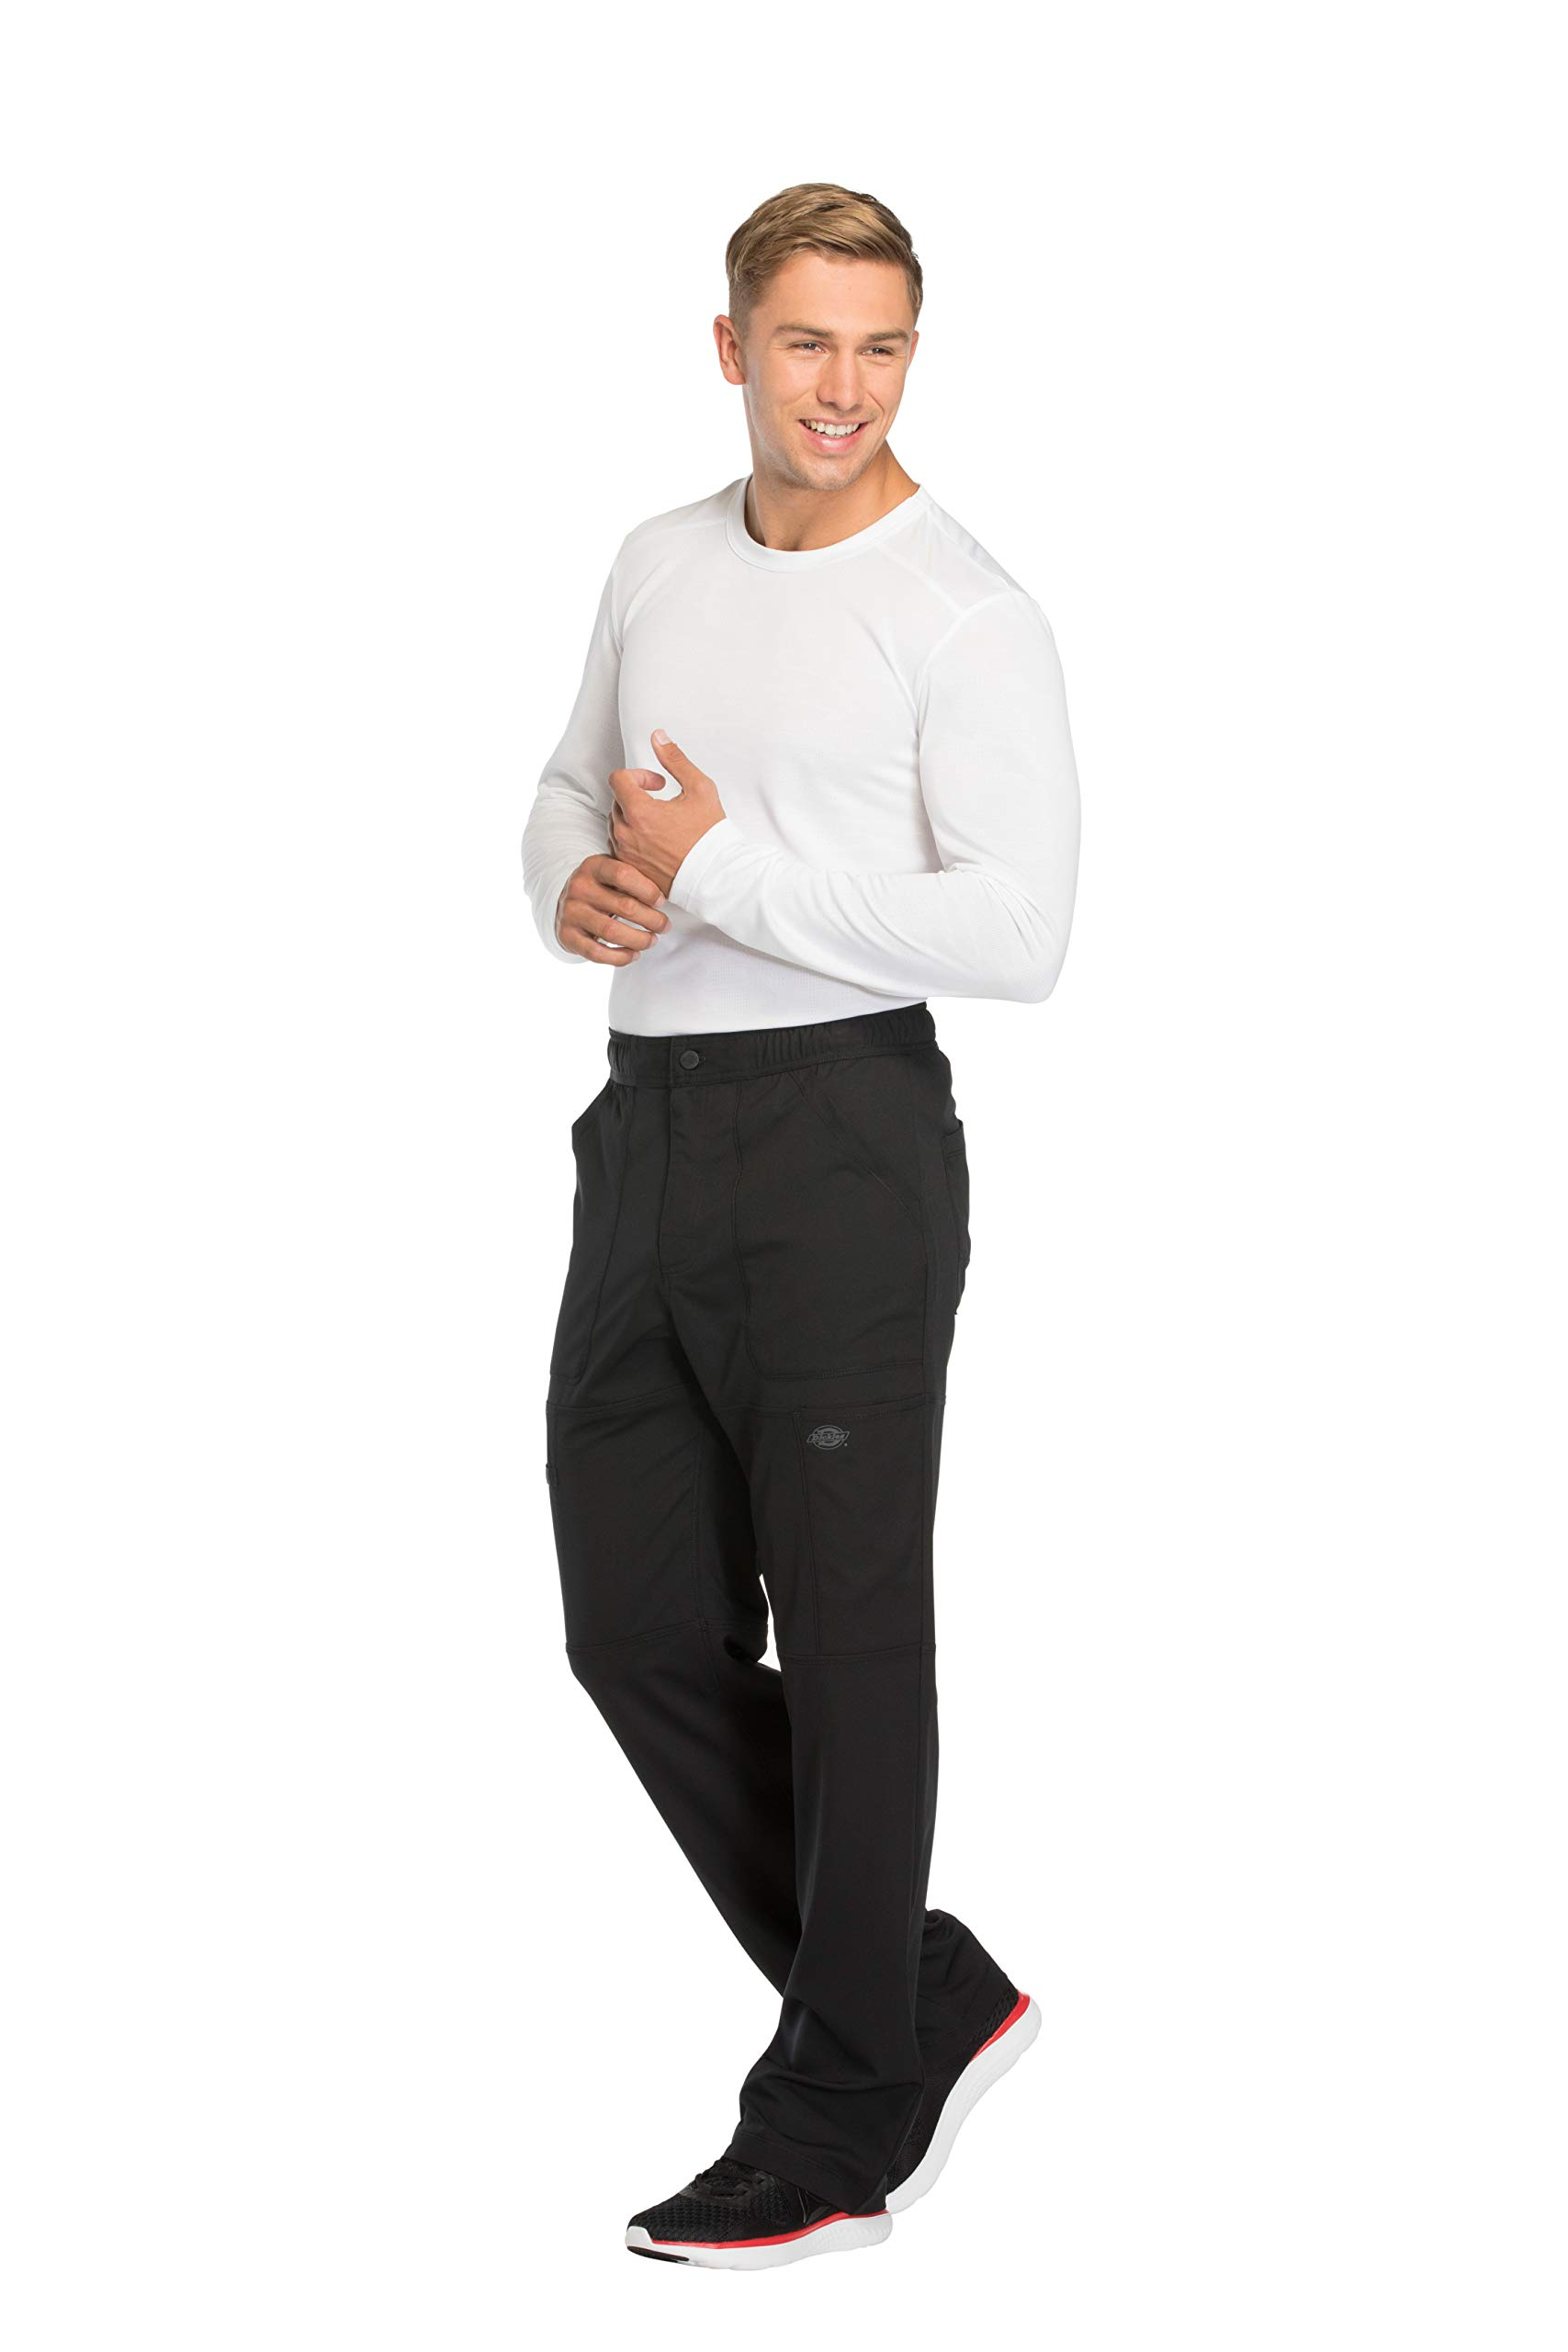 Dynamix Men's DK110 Natural Rise Zip Fly Cargo Pant- Black- Medium